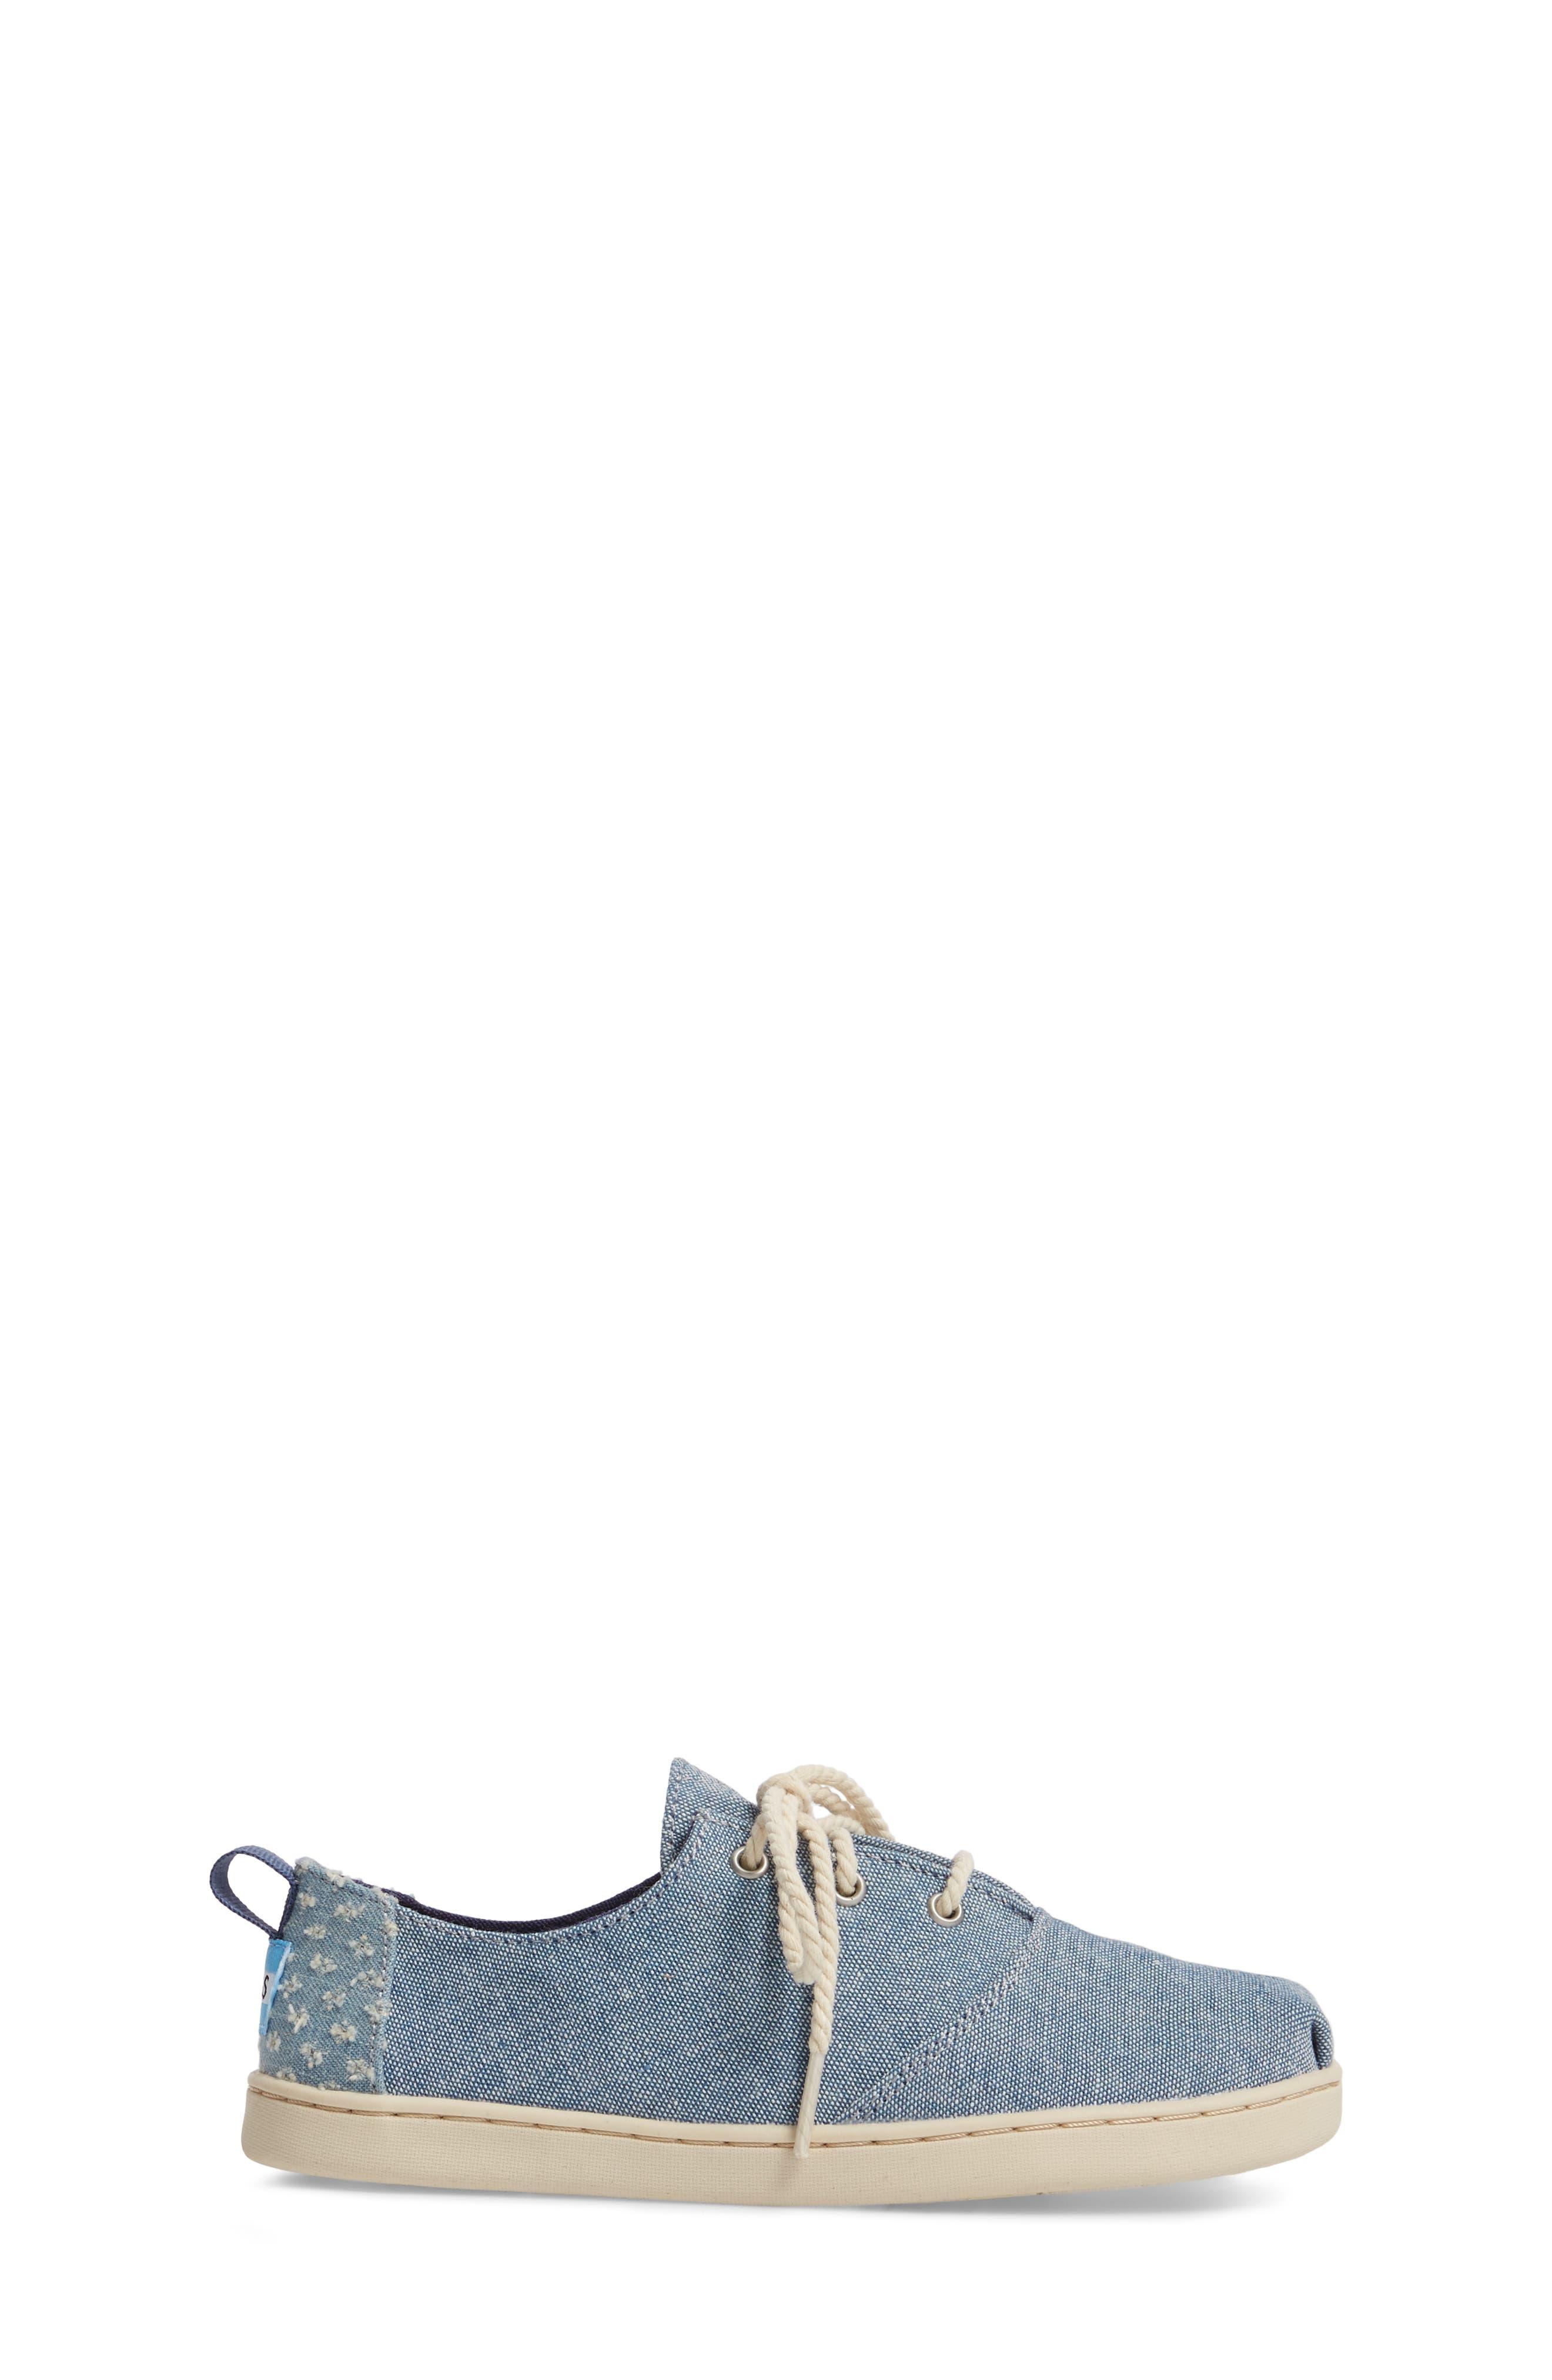 Lumin Sneaker,                             Alternate thumbnail 3, color,                             Blue Chambray